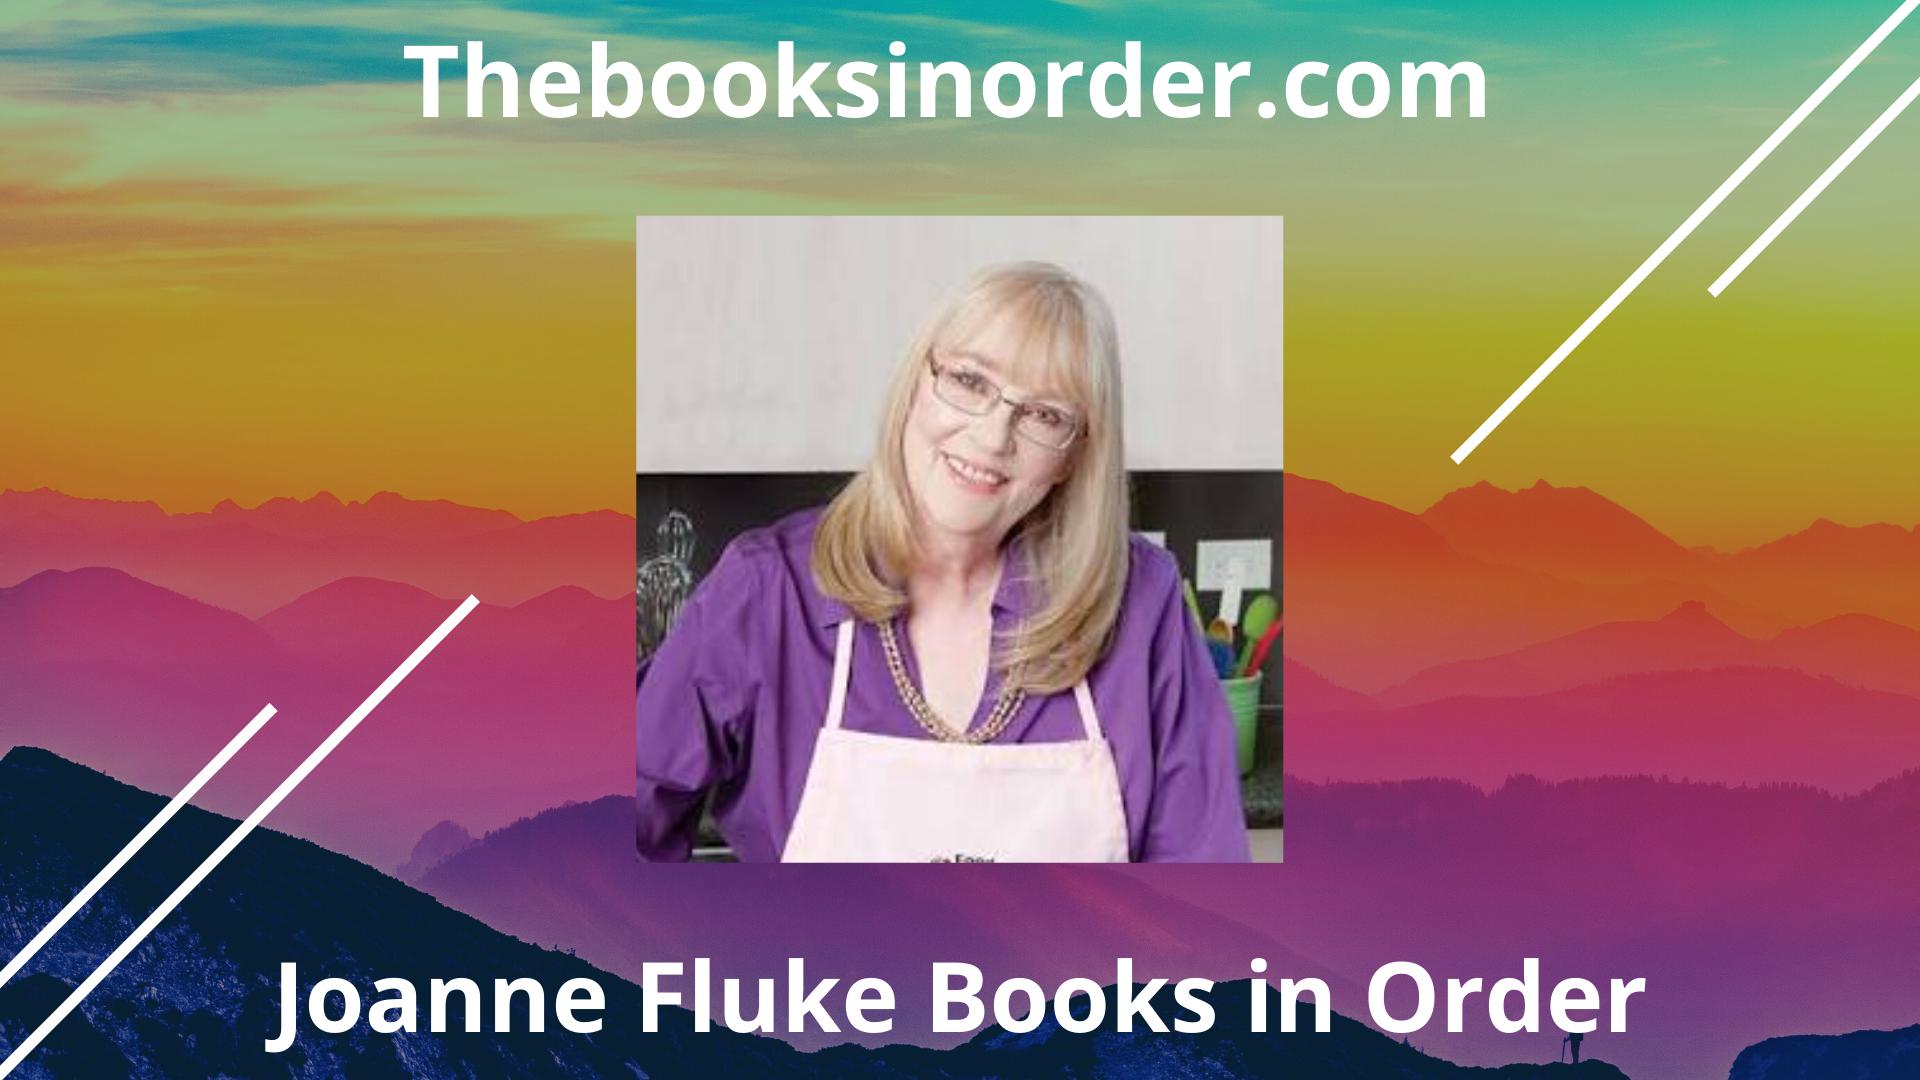 hannah swensen, hannah swensen books in order, joanne fluke books, joanne fluke books in order